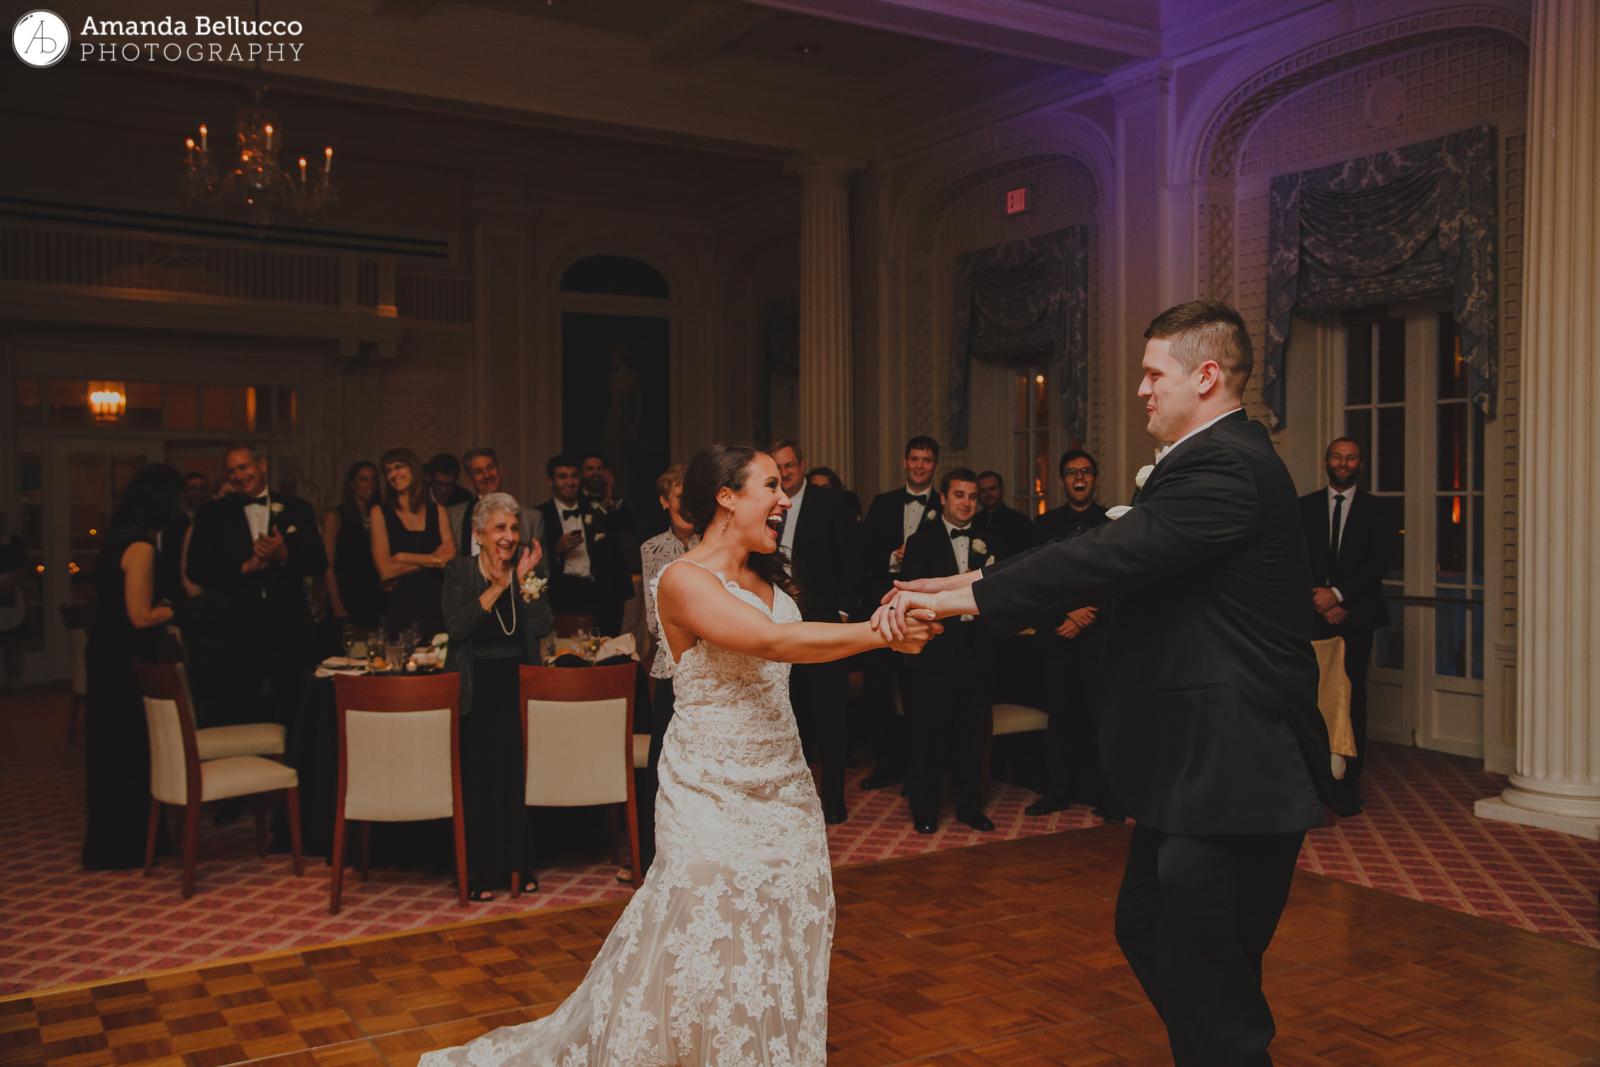 syracuse-rochester-fine-art-wedding-photographer-146.JPG